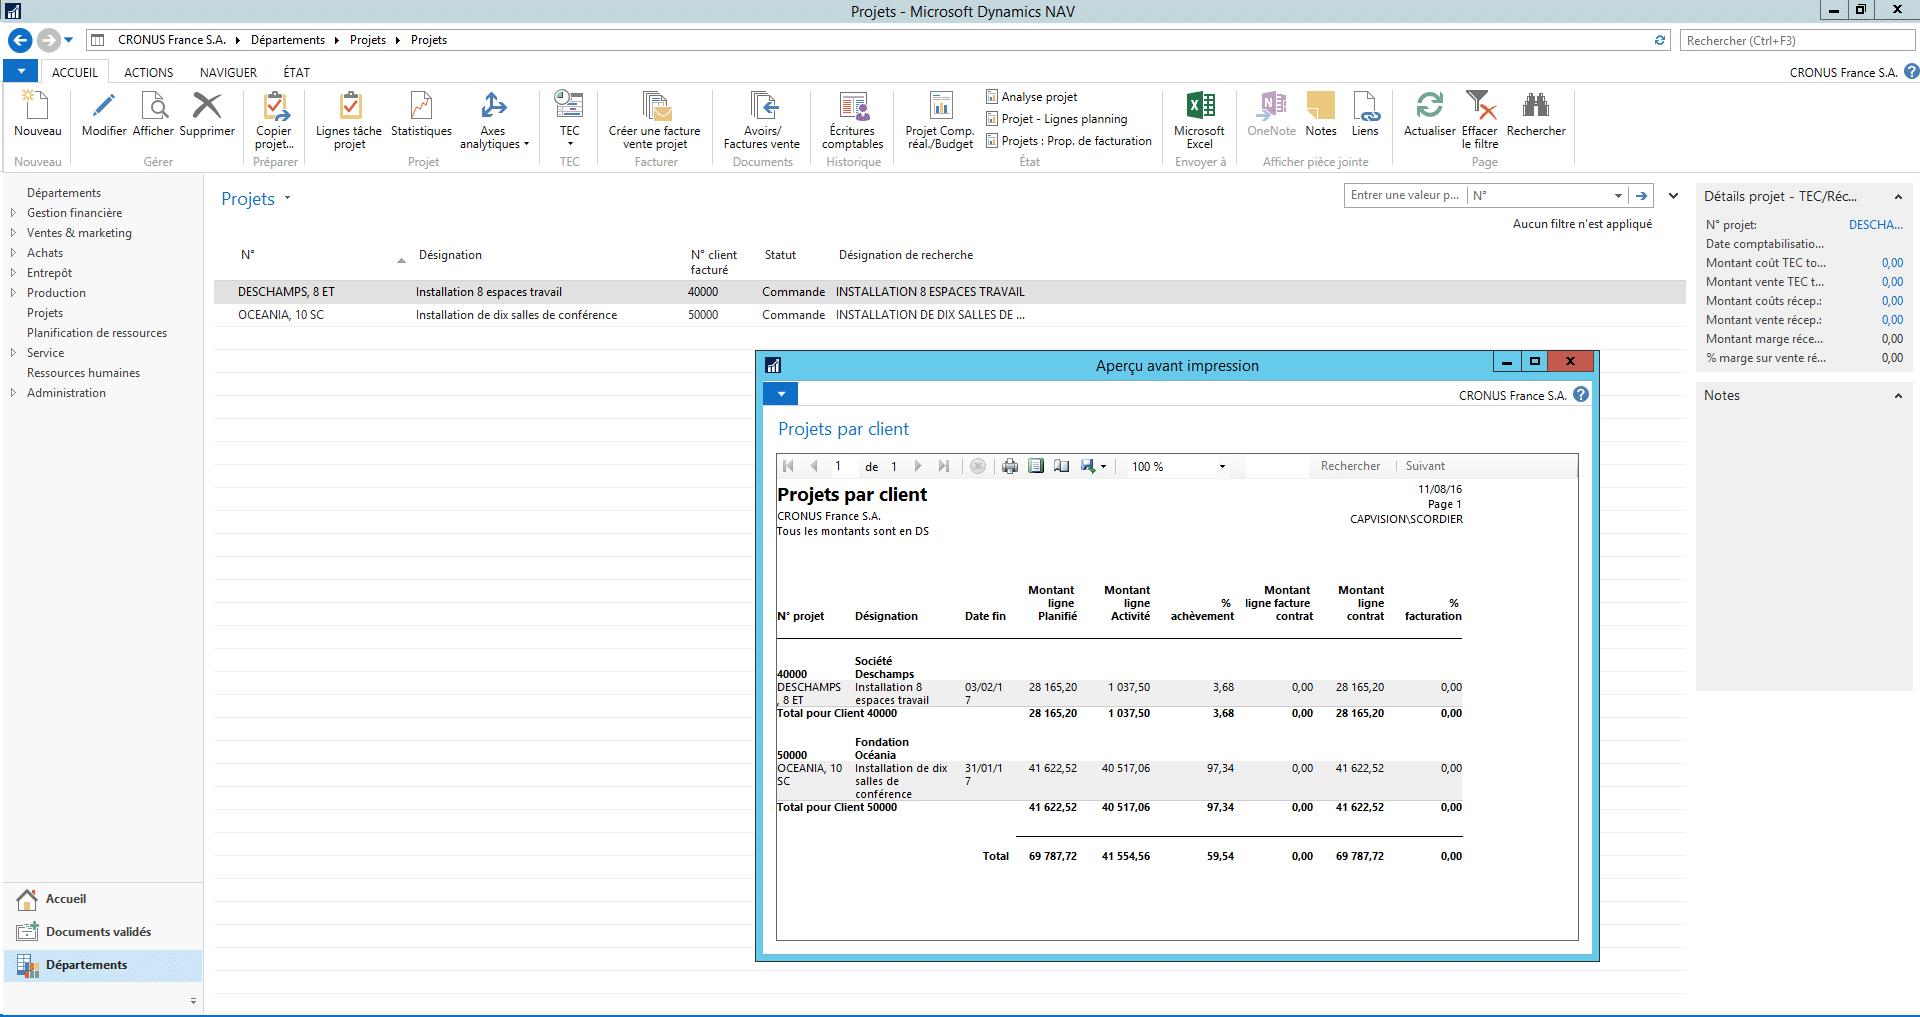 Projets par client - Microsoft Dynamics NAV 2016